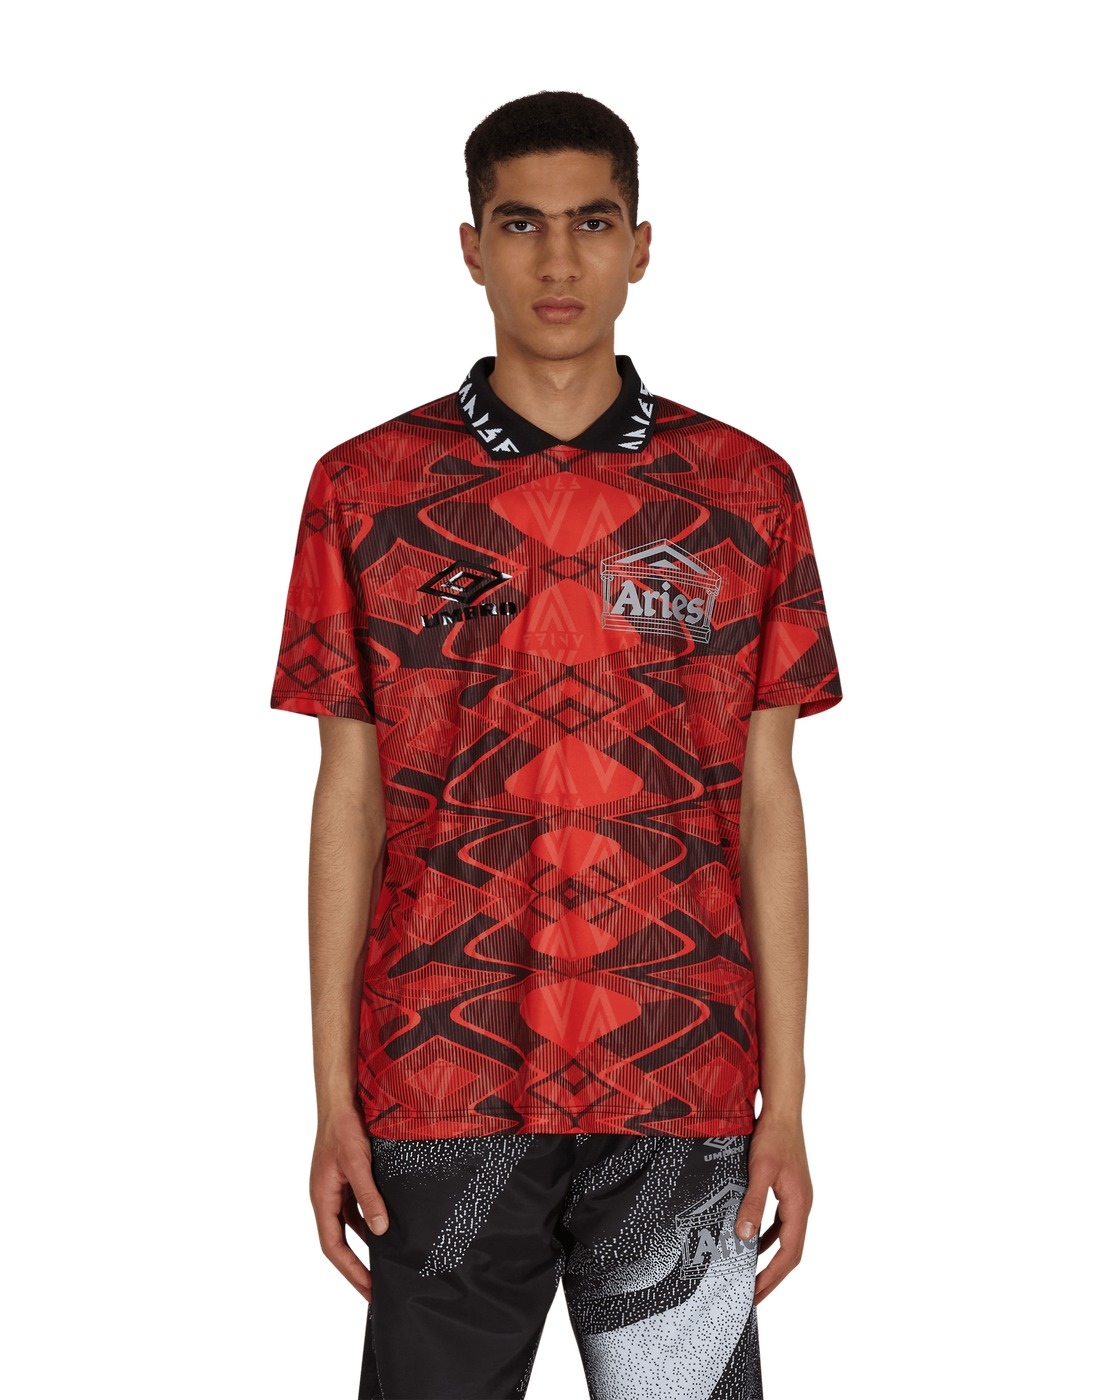 Aries Umbro Football Jersey Red/Black